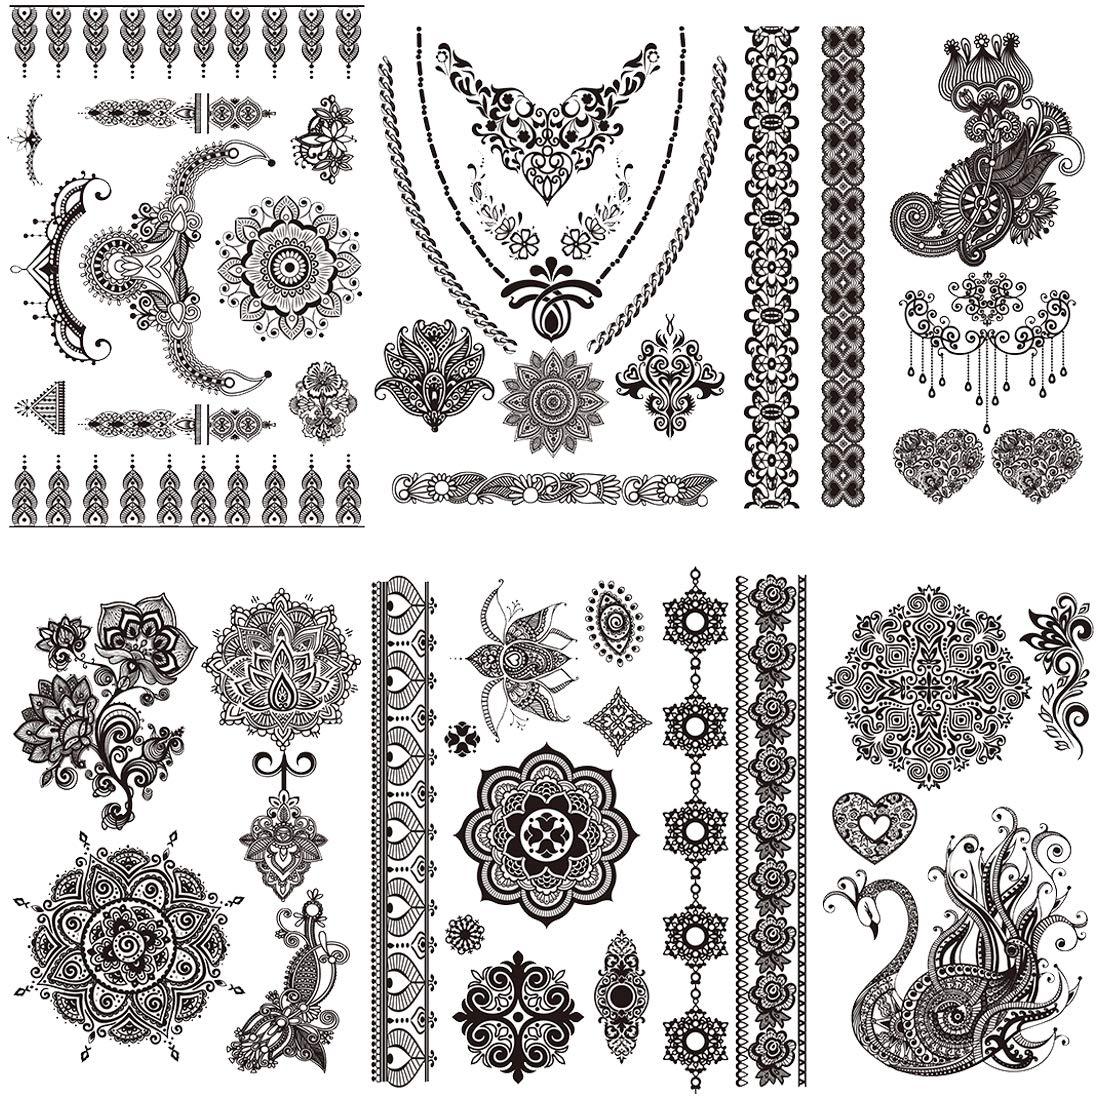 Tattoo Stickers Lace Black Fake Temporary Tattoos Mandala For Adults Women Girls Feather Flower Body Art Arm Sexy Wedding Tatoos Paper - 6 Pcs